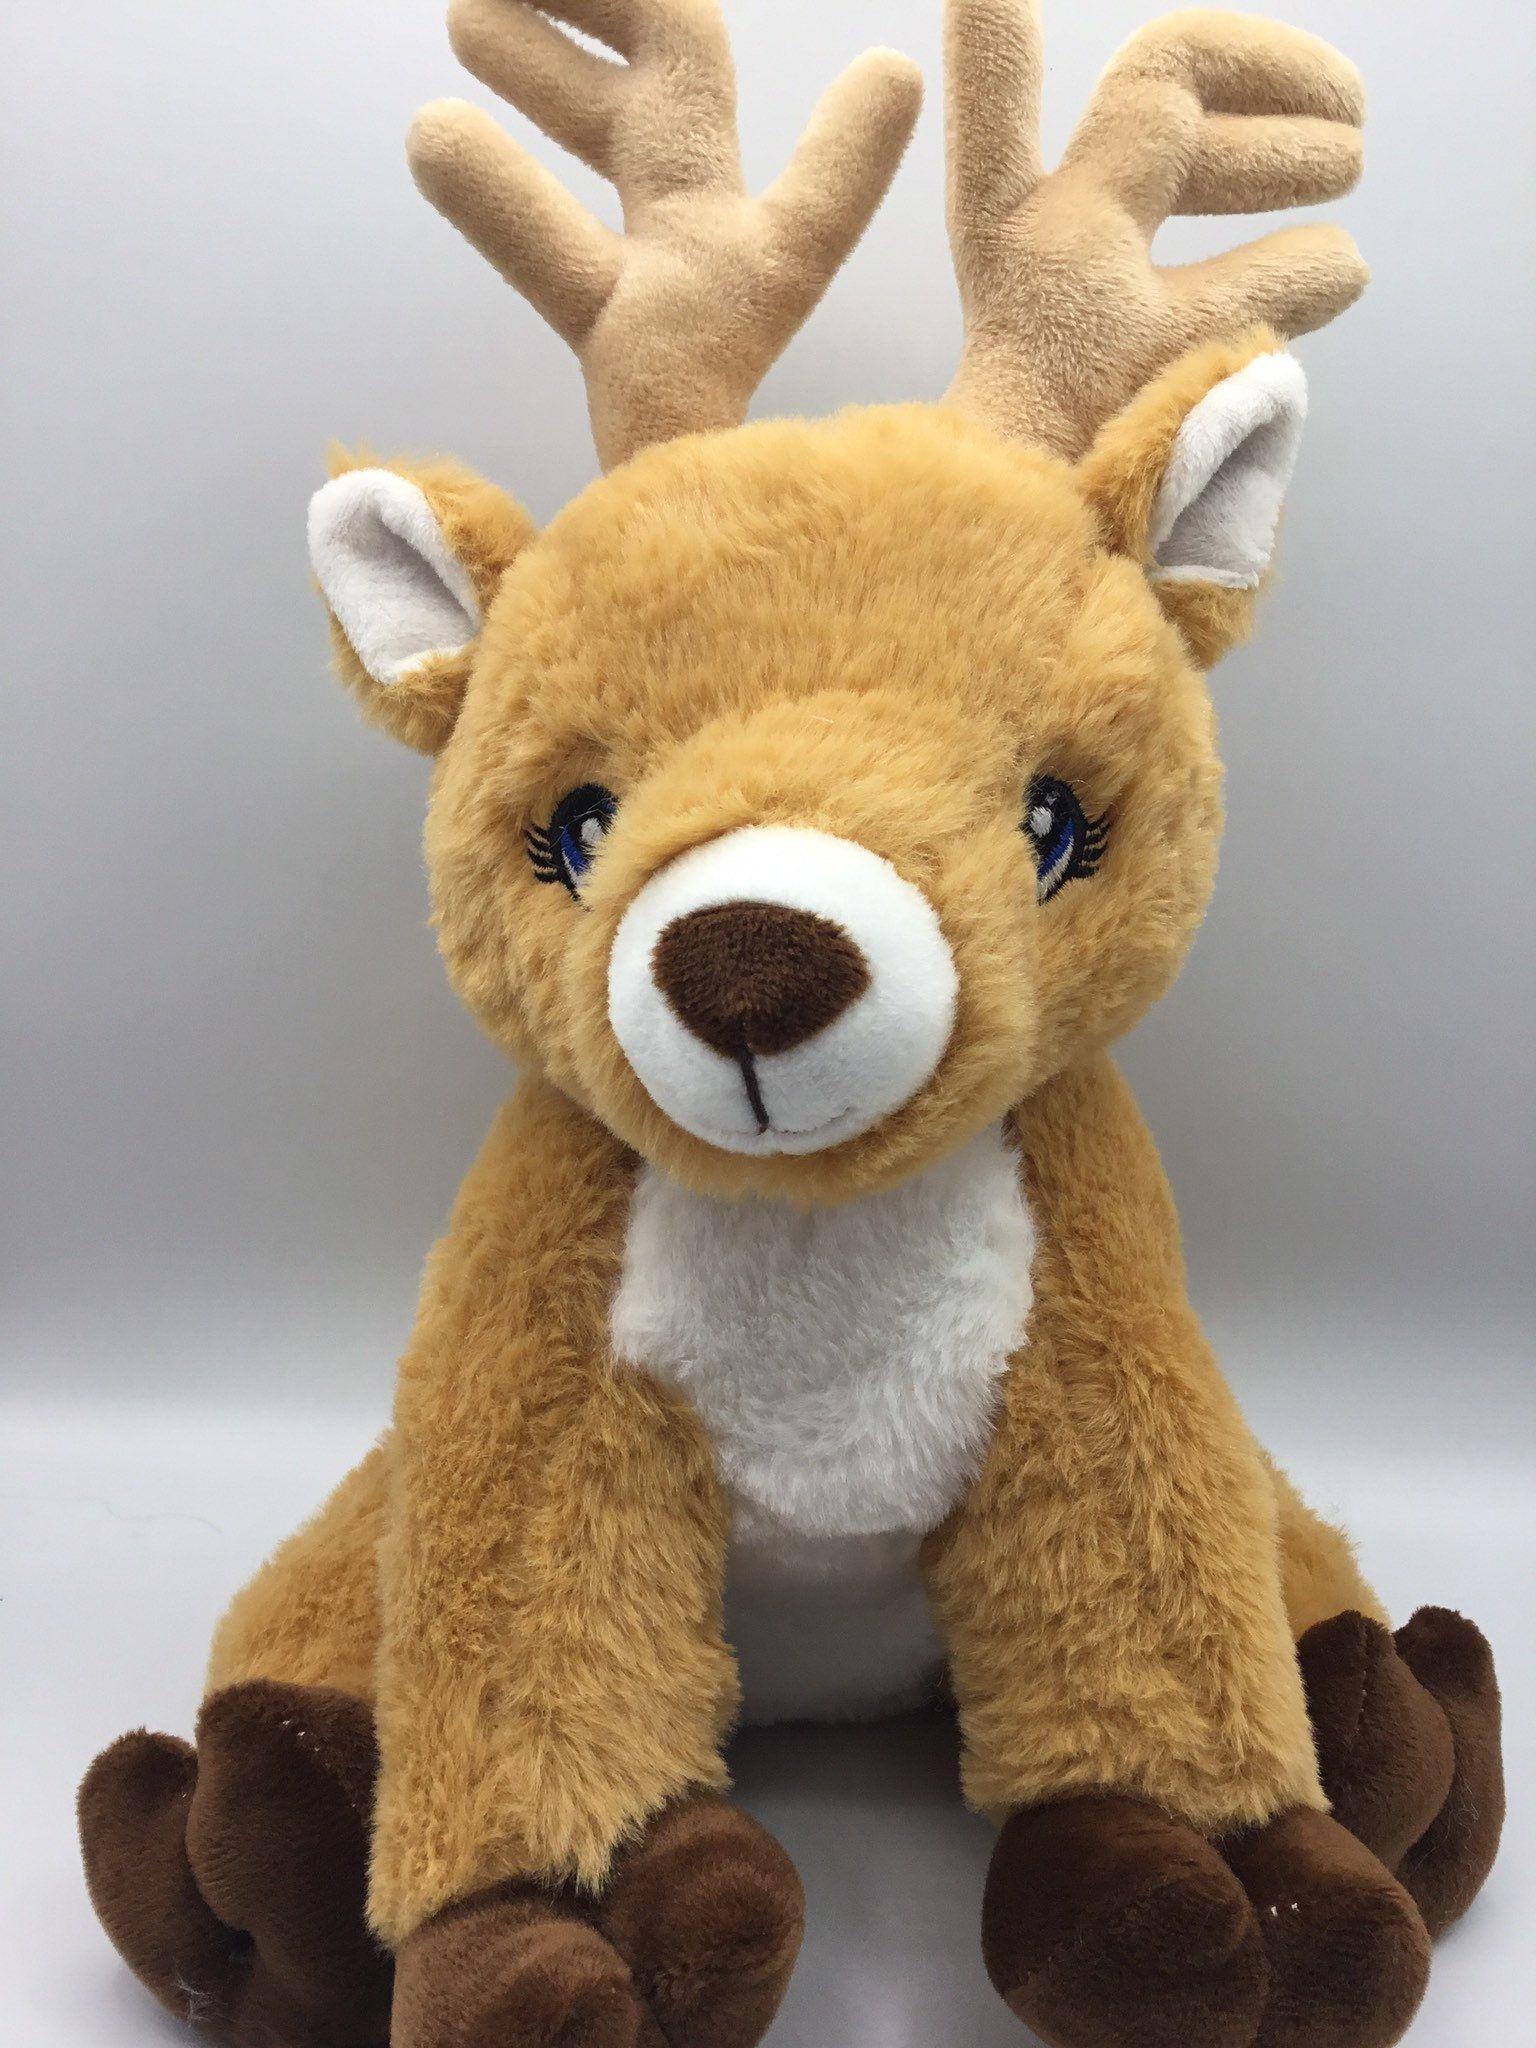 Heatable Stuffed Animal Stuffed Animal Birthday Gift Christmas Gift In 2020 Cute Stuffed Animals Monkey Stuffed Animal Soft Stuffed Animals